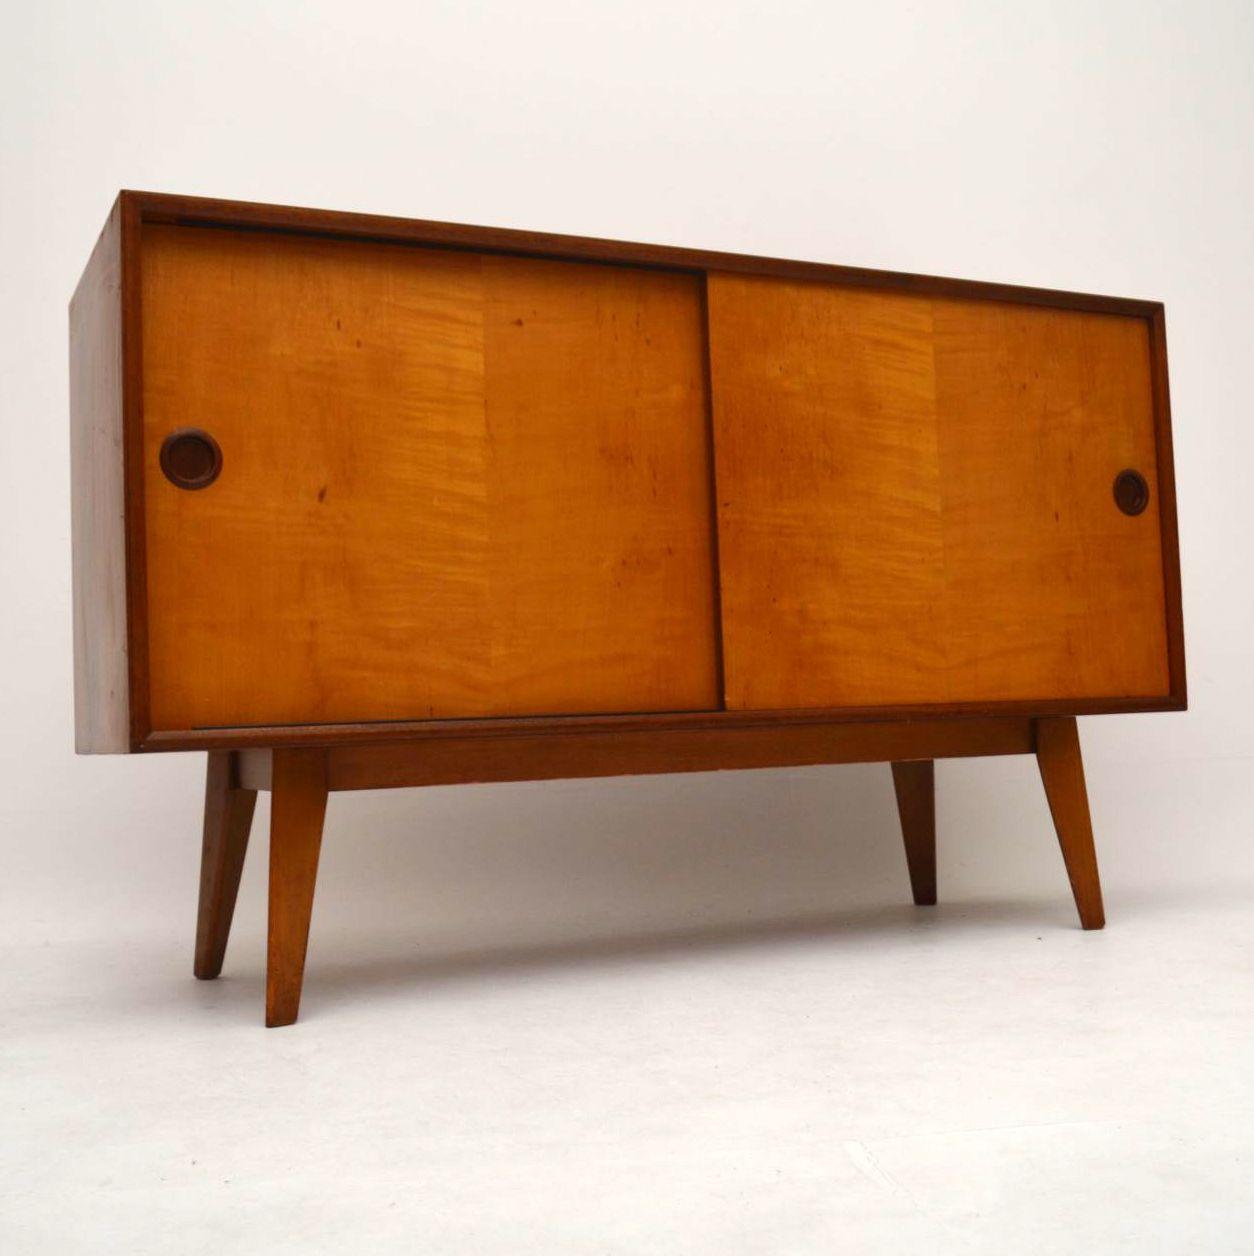 Retro Satin Wood& Mahogany Sideboard by Vanson Vintage 1950 u2019s Retrospective Interiors